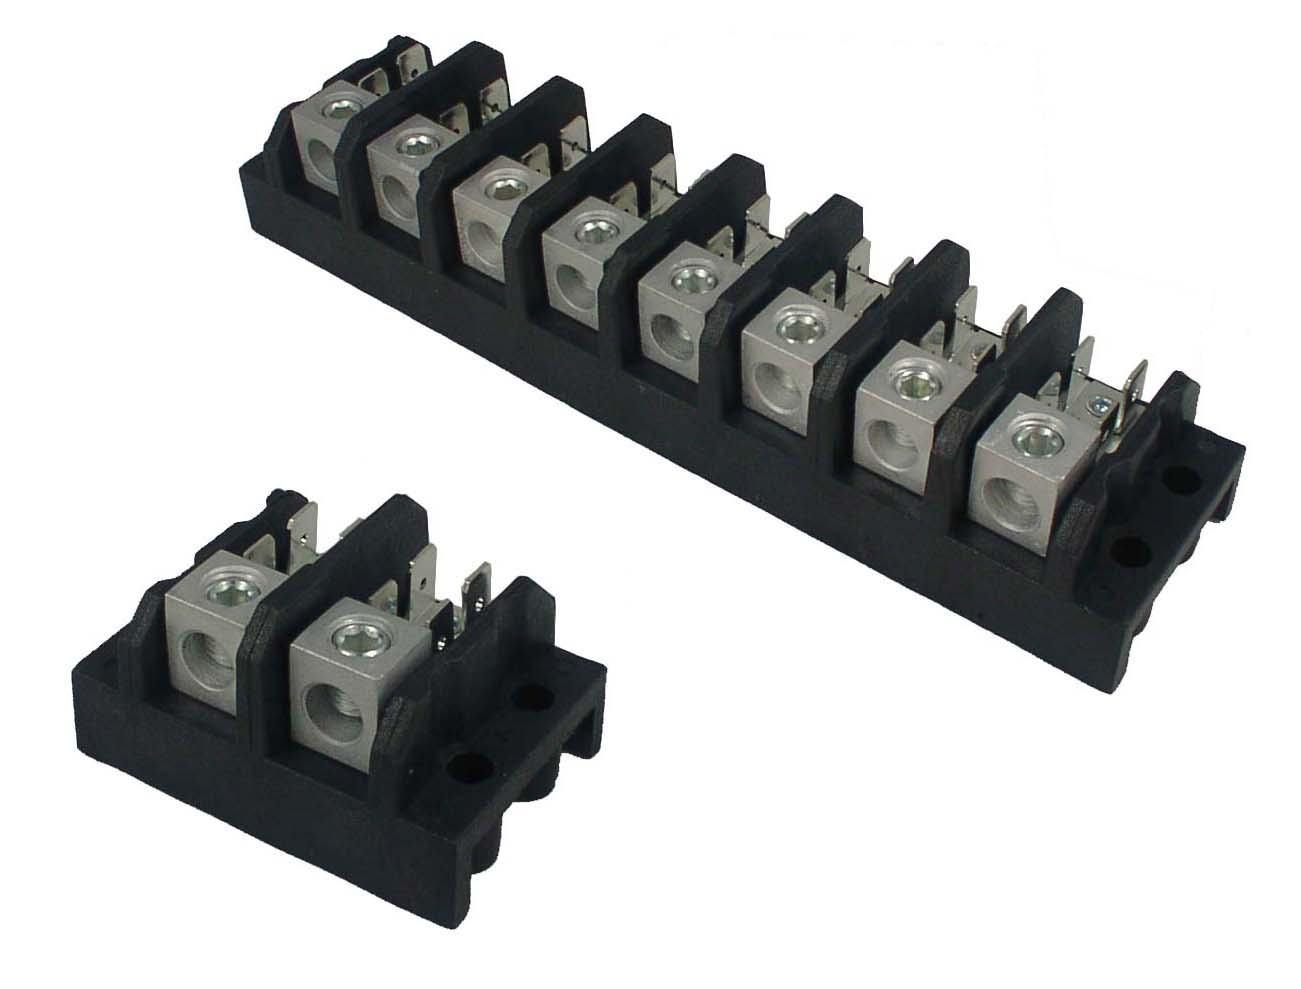 110 block wiring templates 110 block dwg